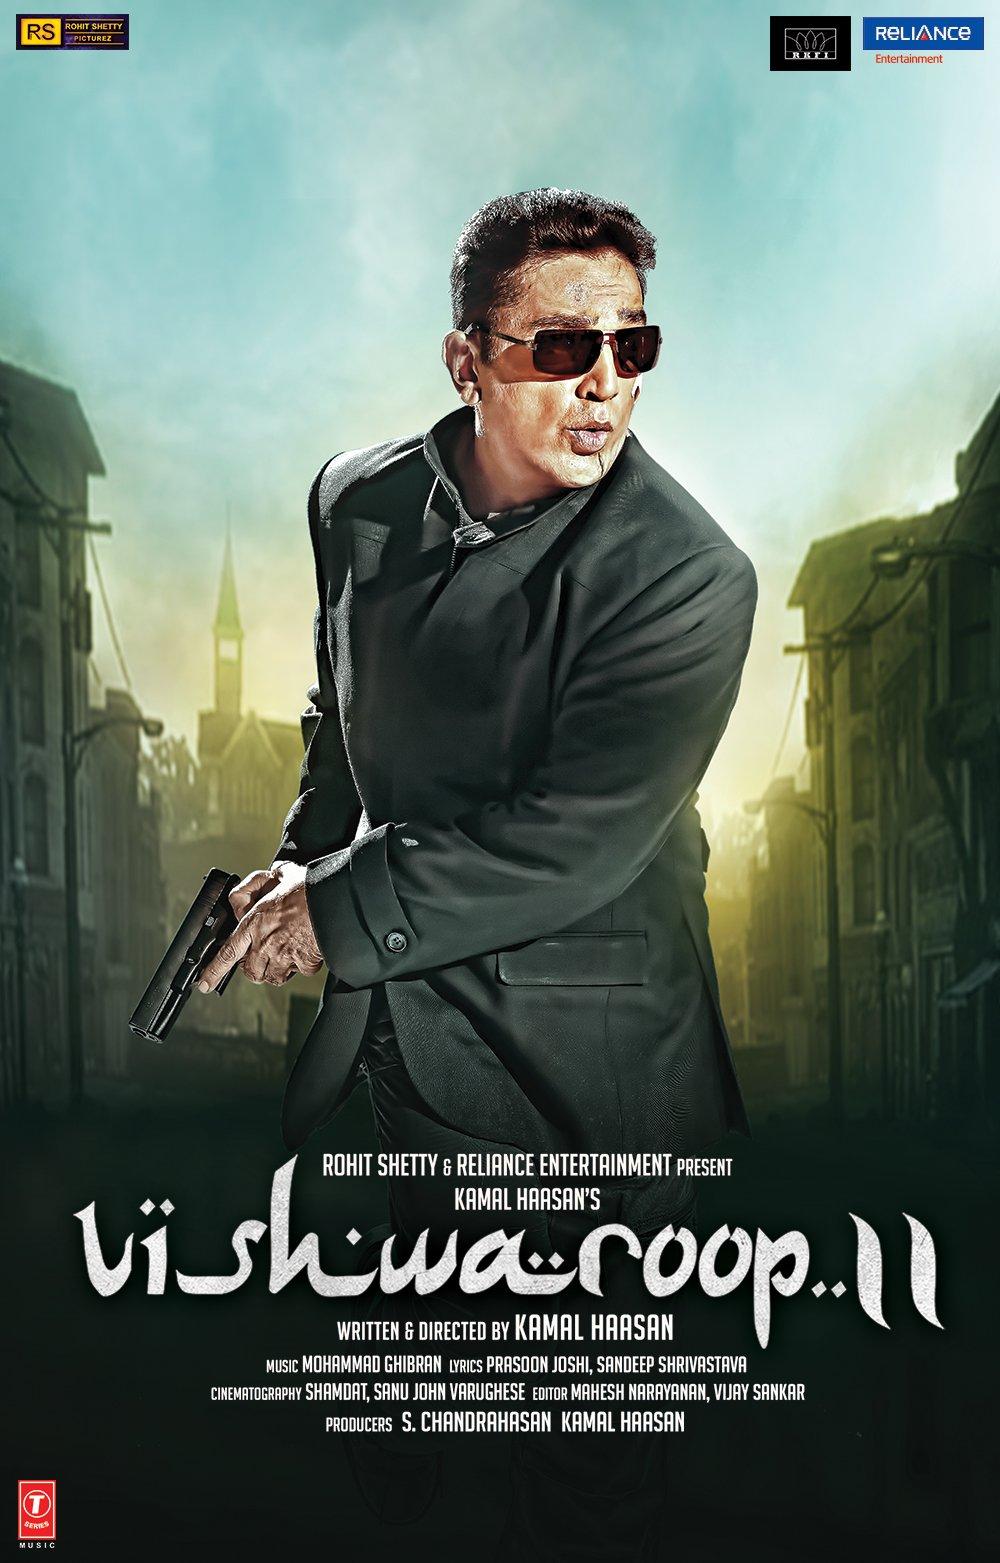 vishwaroopam 2 full movie online free tamil